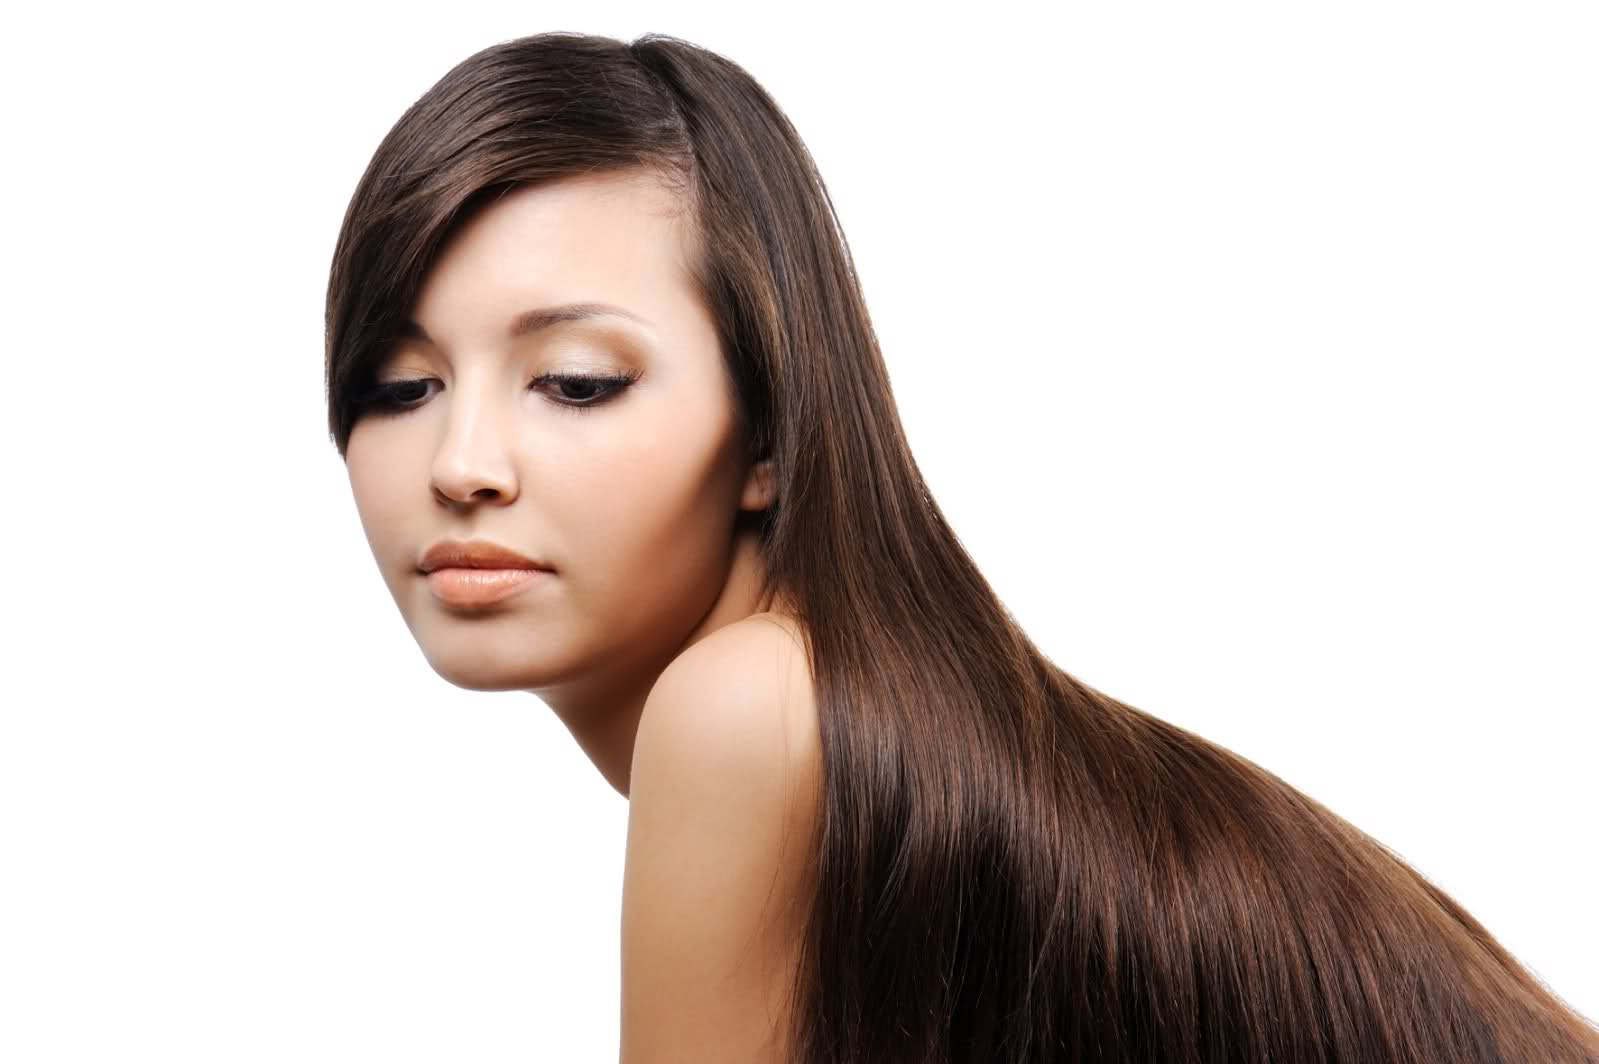 Entradas de cabello en mujeres